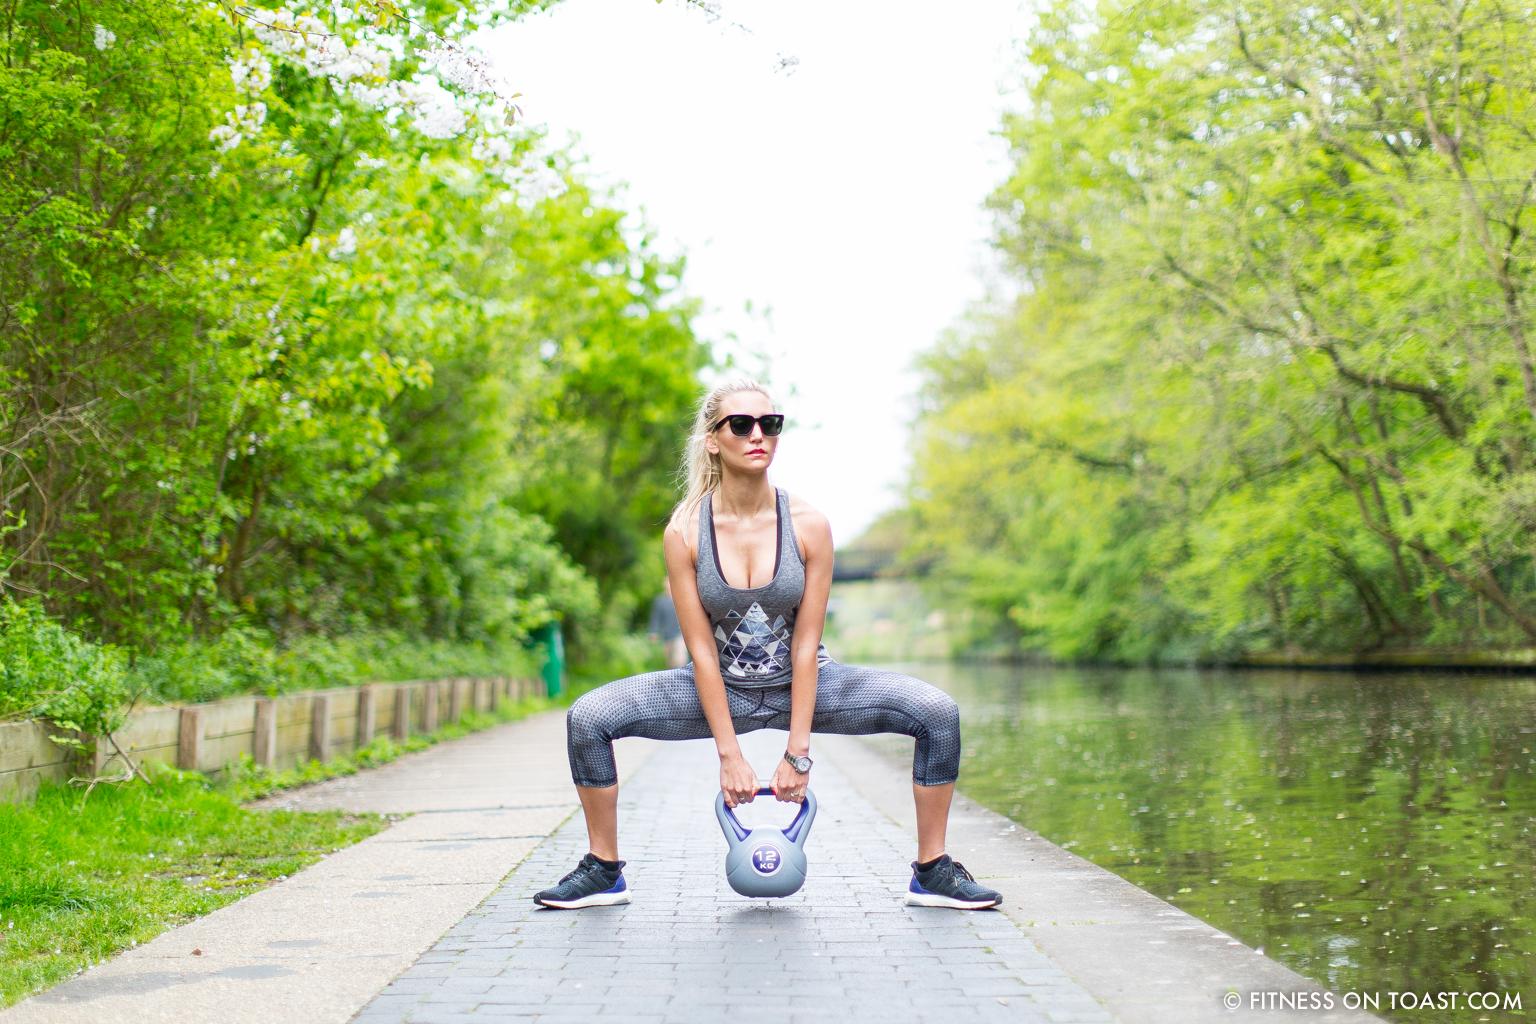 Fitness On Toast Faya Blog Girl Healthy Workout Regents Canal London Kettle Bell Squat Swing Lunge Twist Burpees Old Navy Fashion OOTD Gap Chanel Celine-3